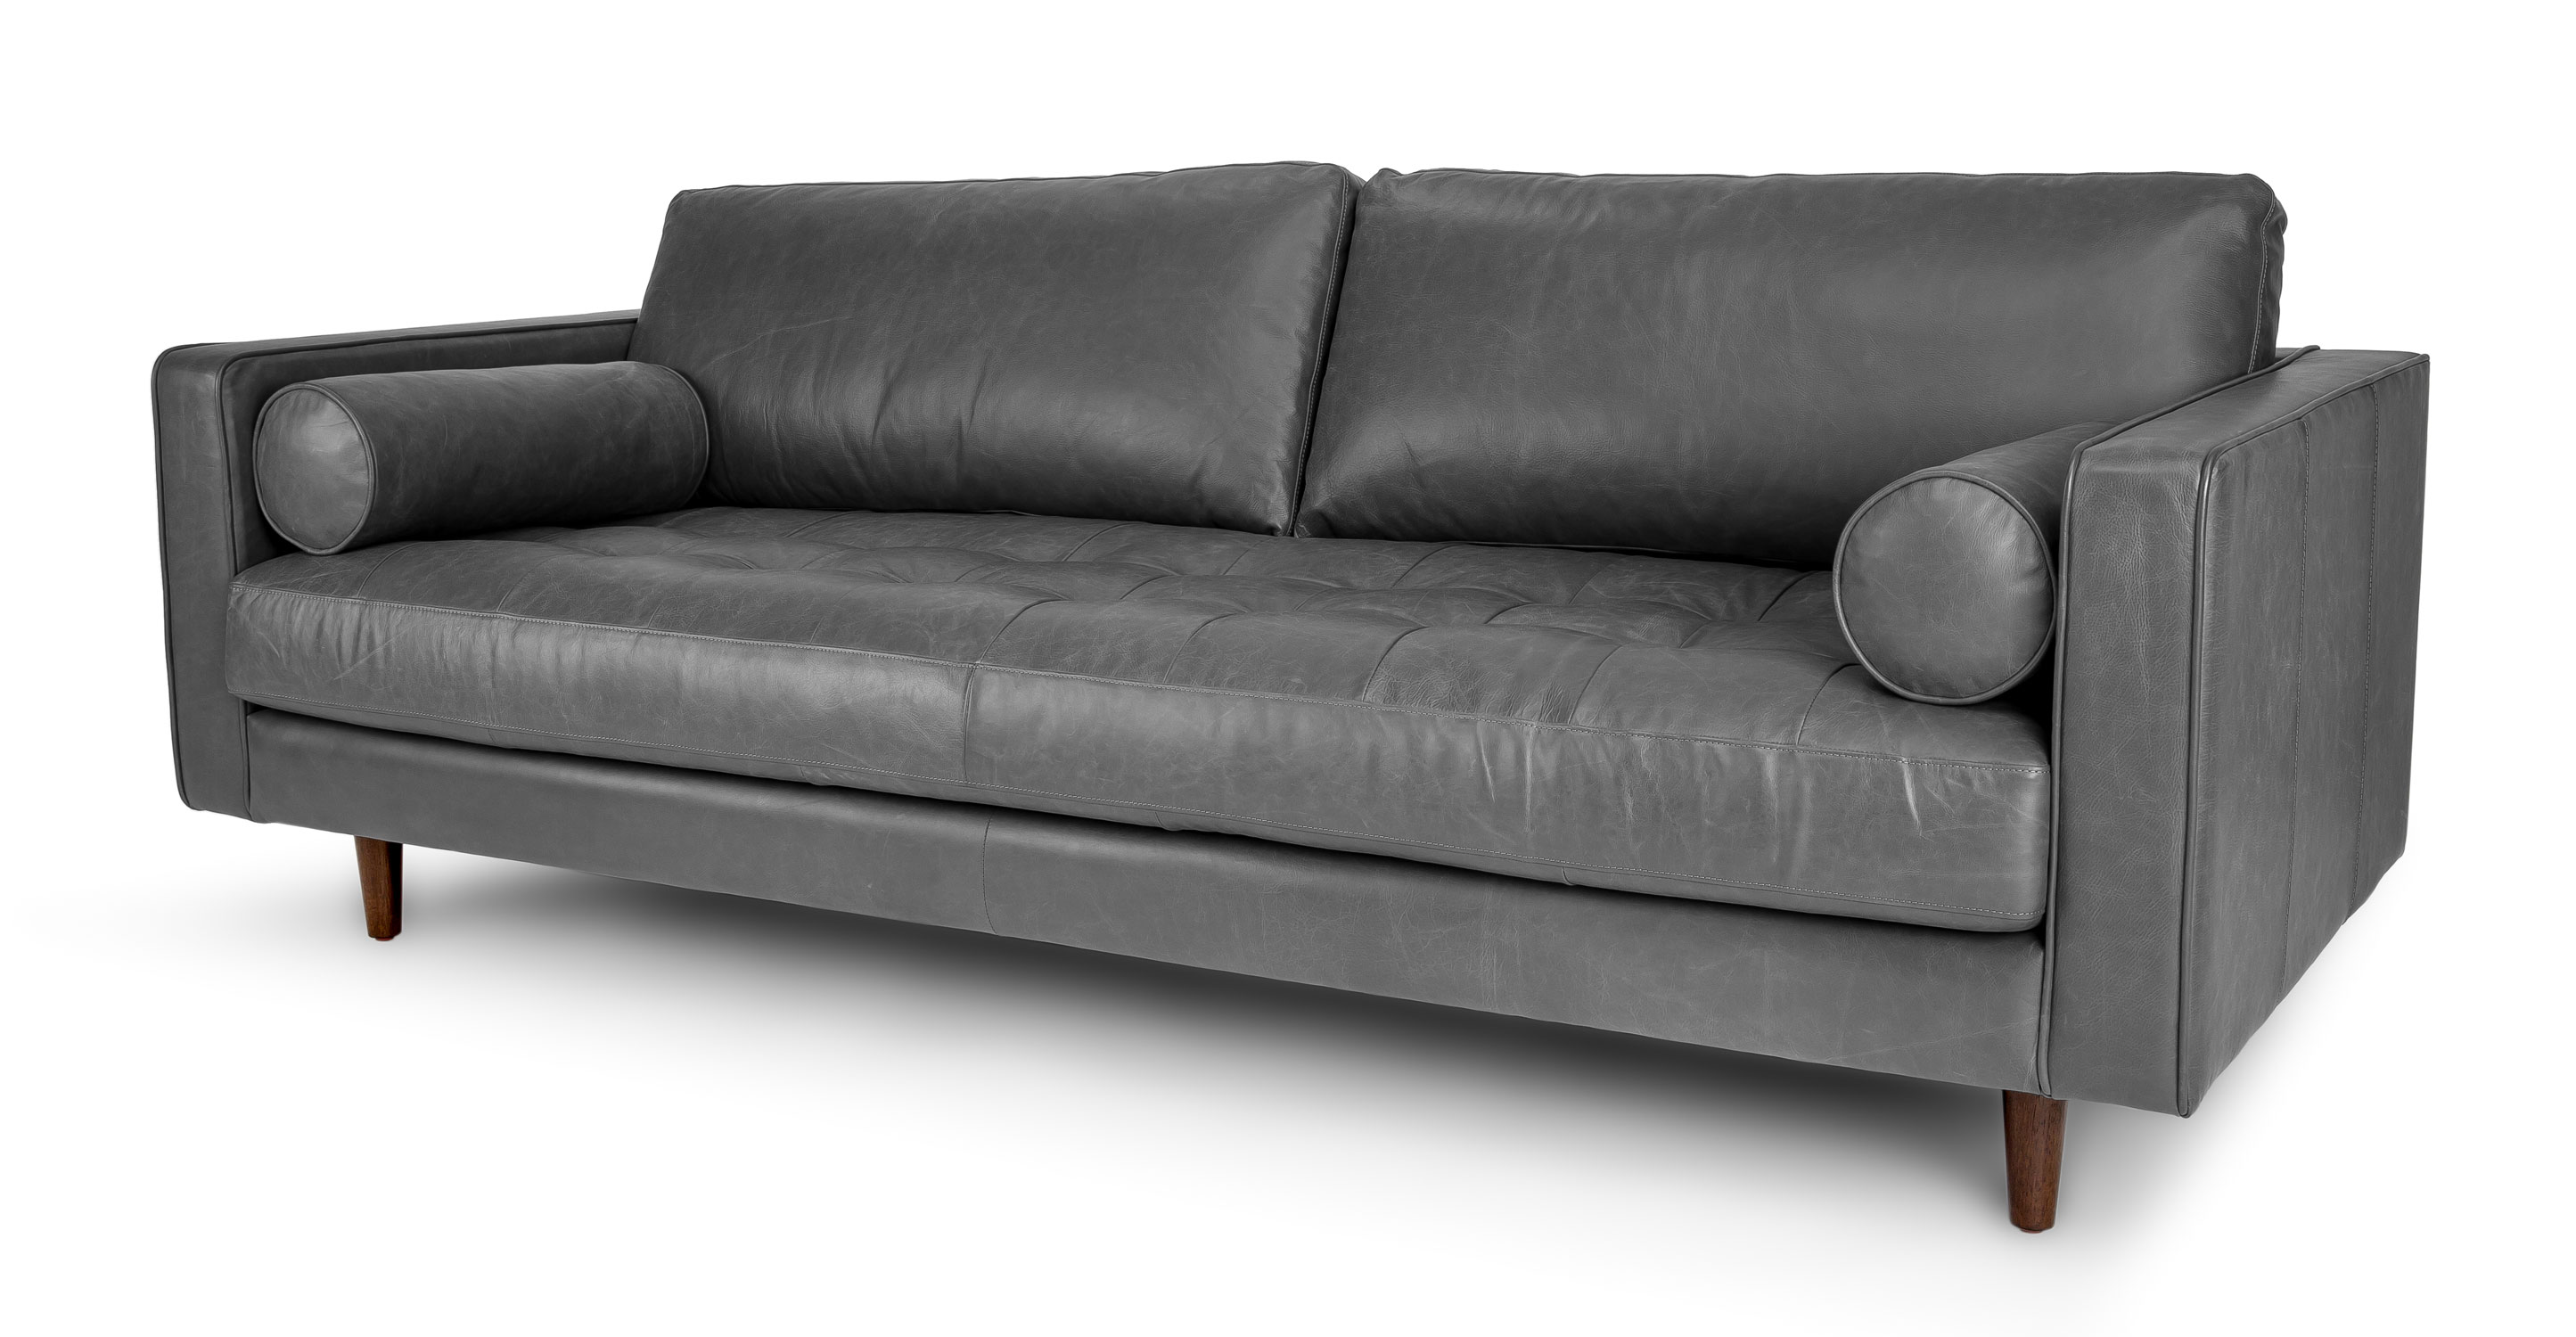 sofa reviews 2017 sofas to go ben sectional ugly brokeasshome